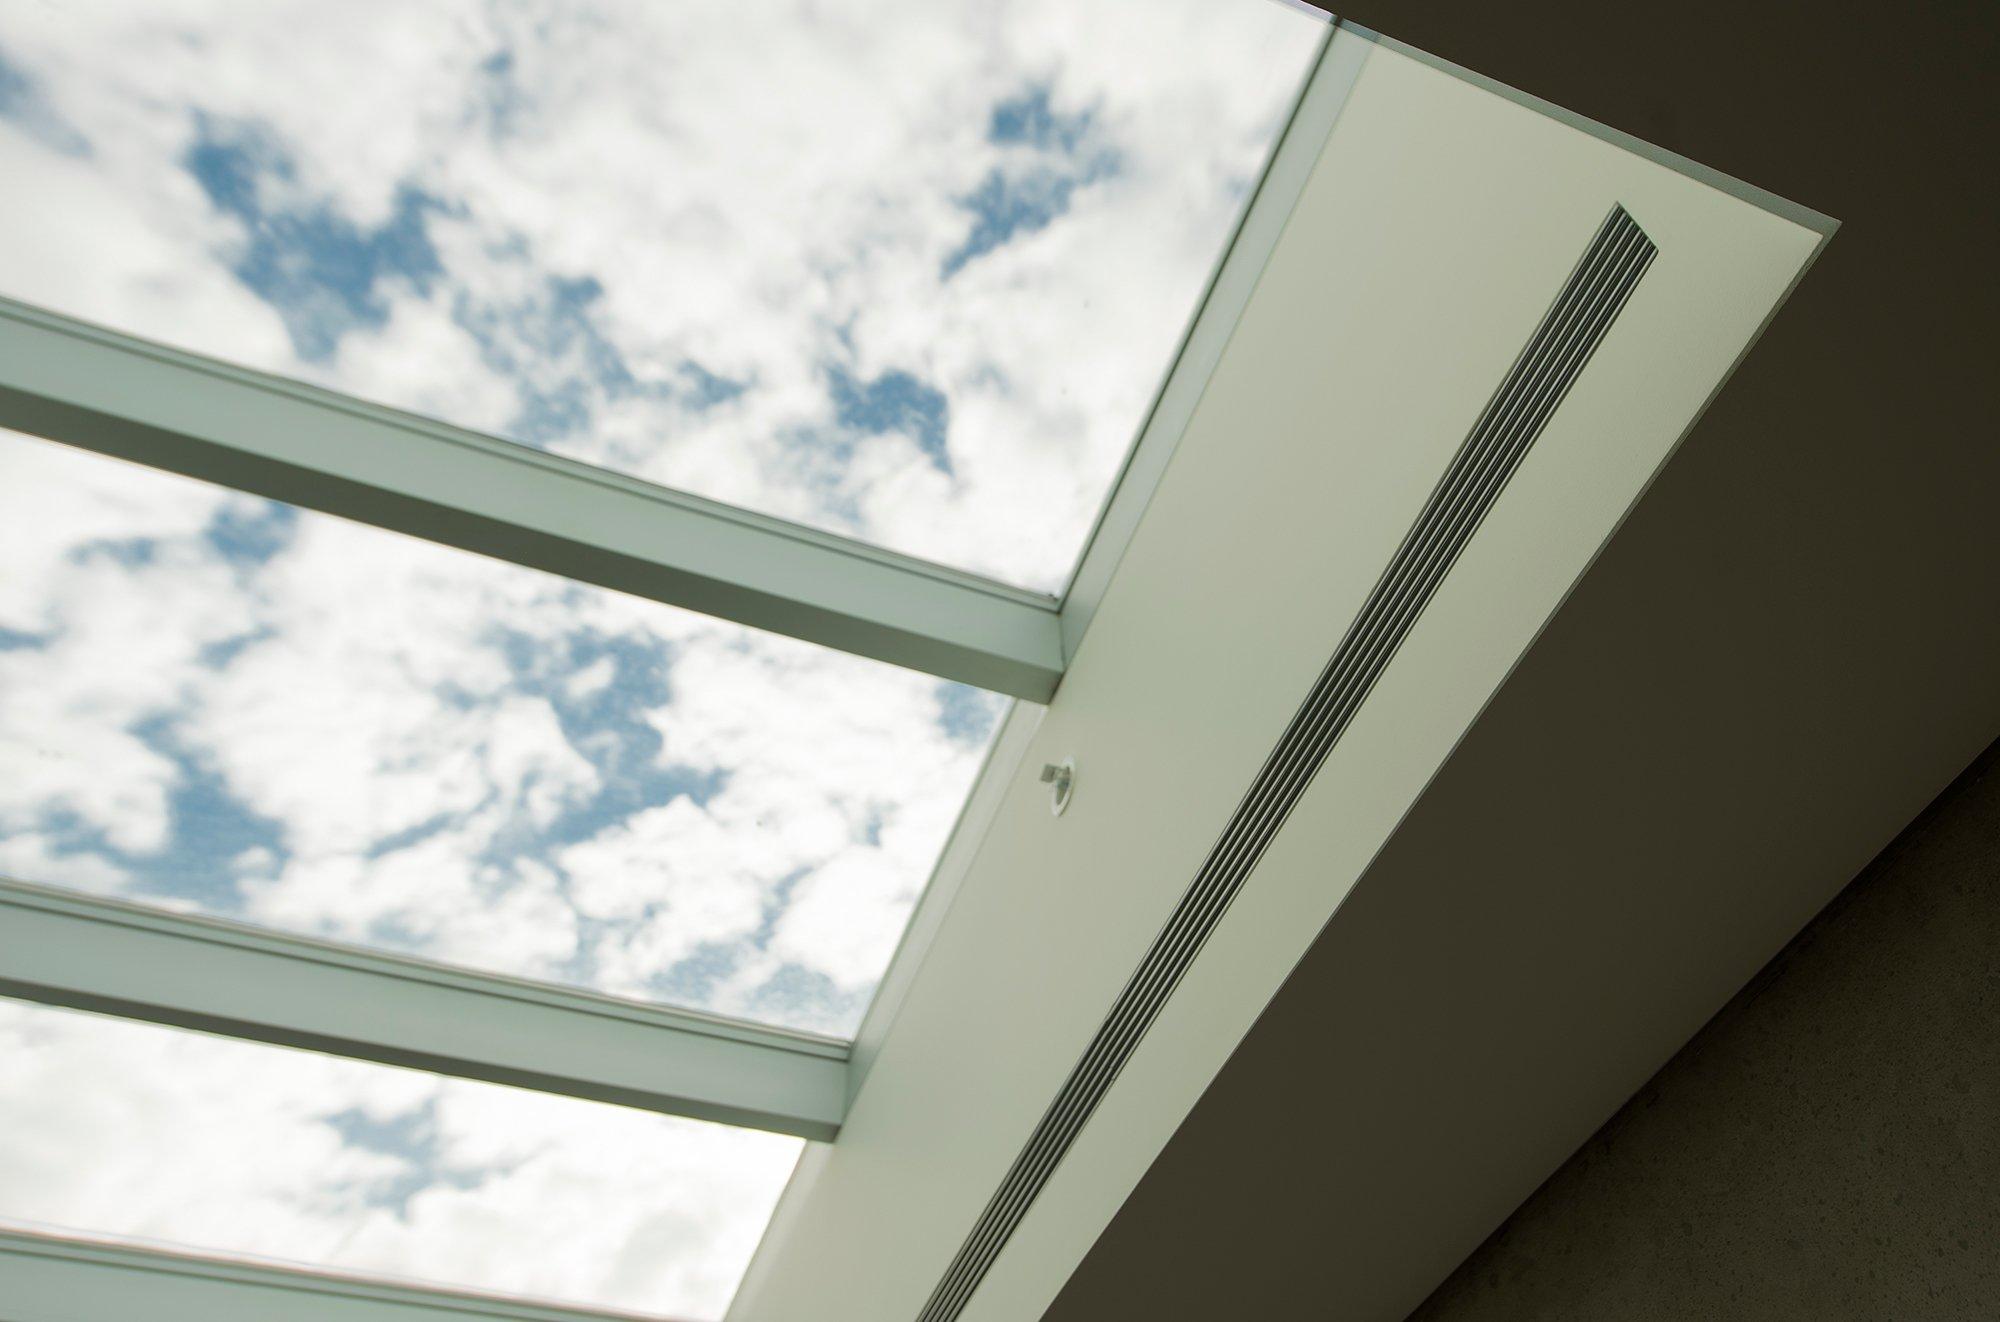 View of skylight